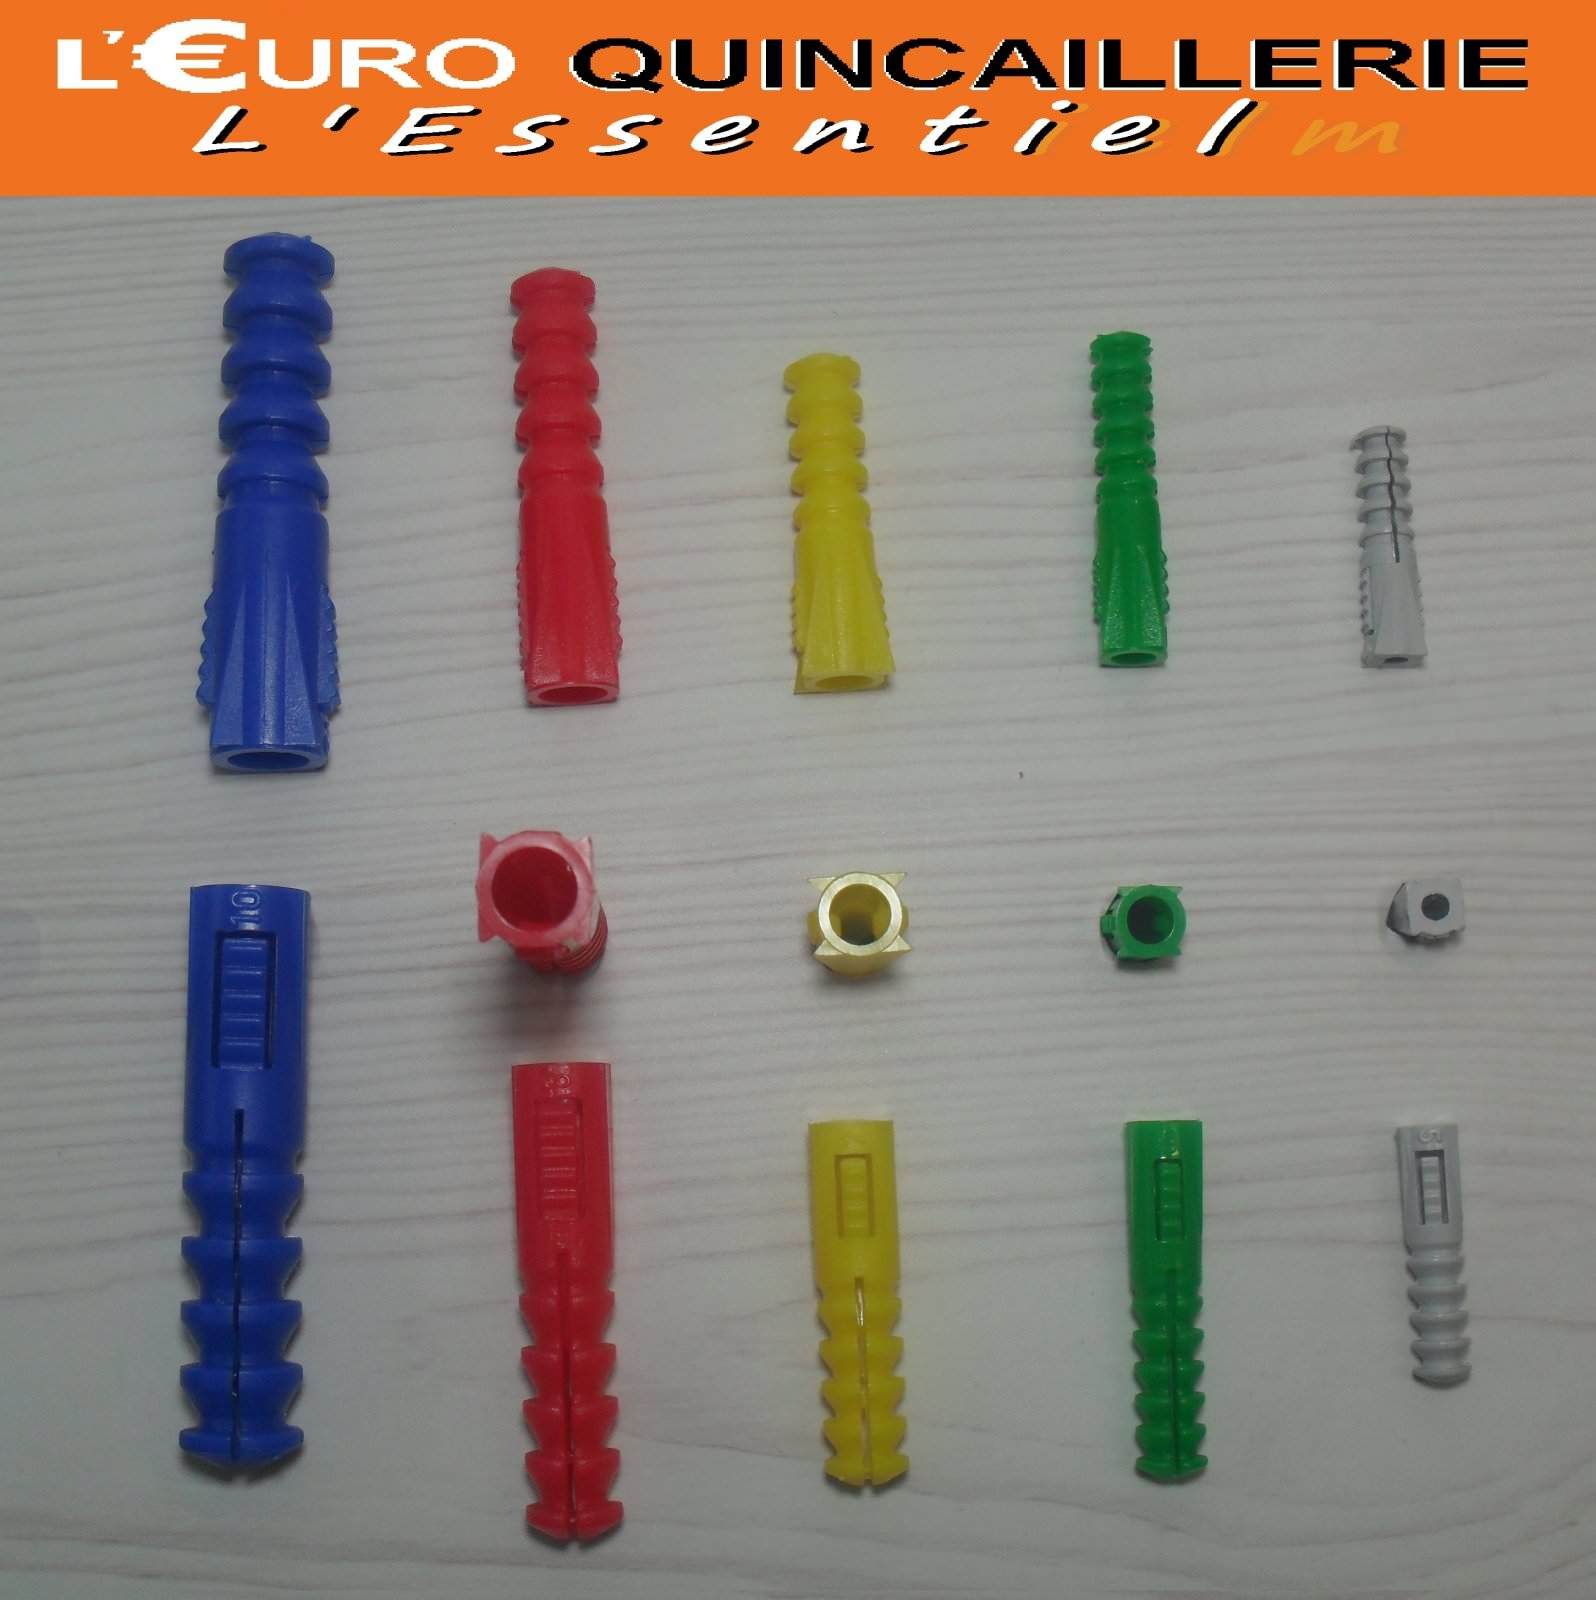 100 Chevilles assorties plastiques  Ø 5-6-7-8-10